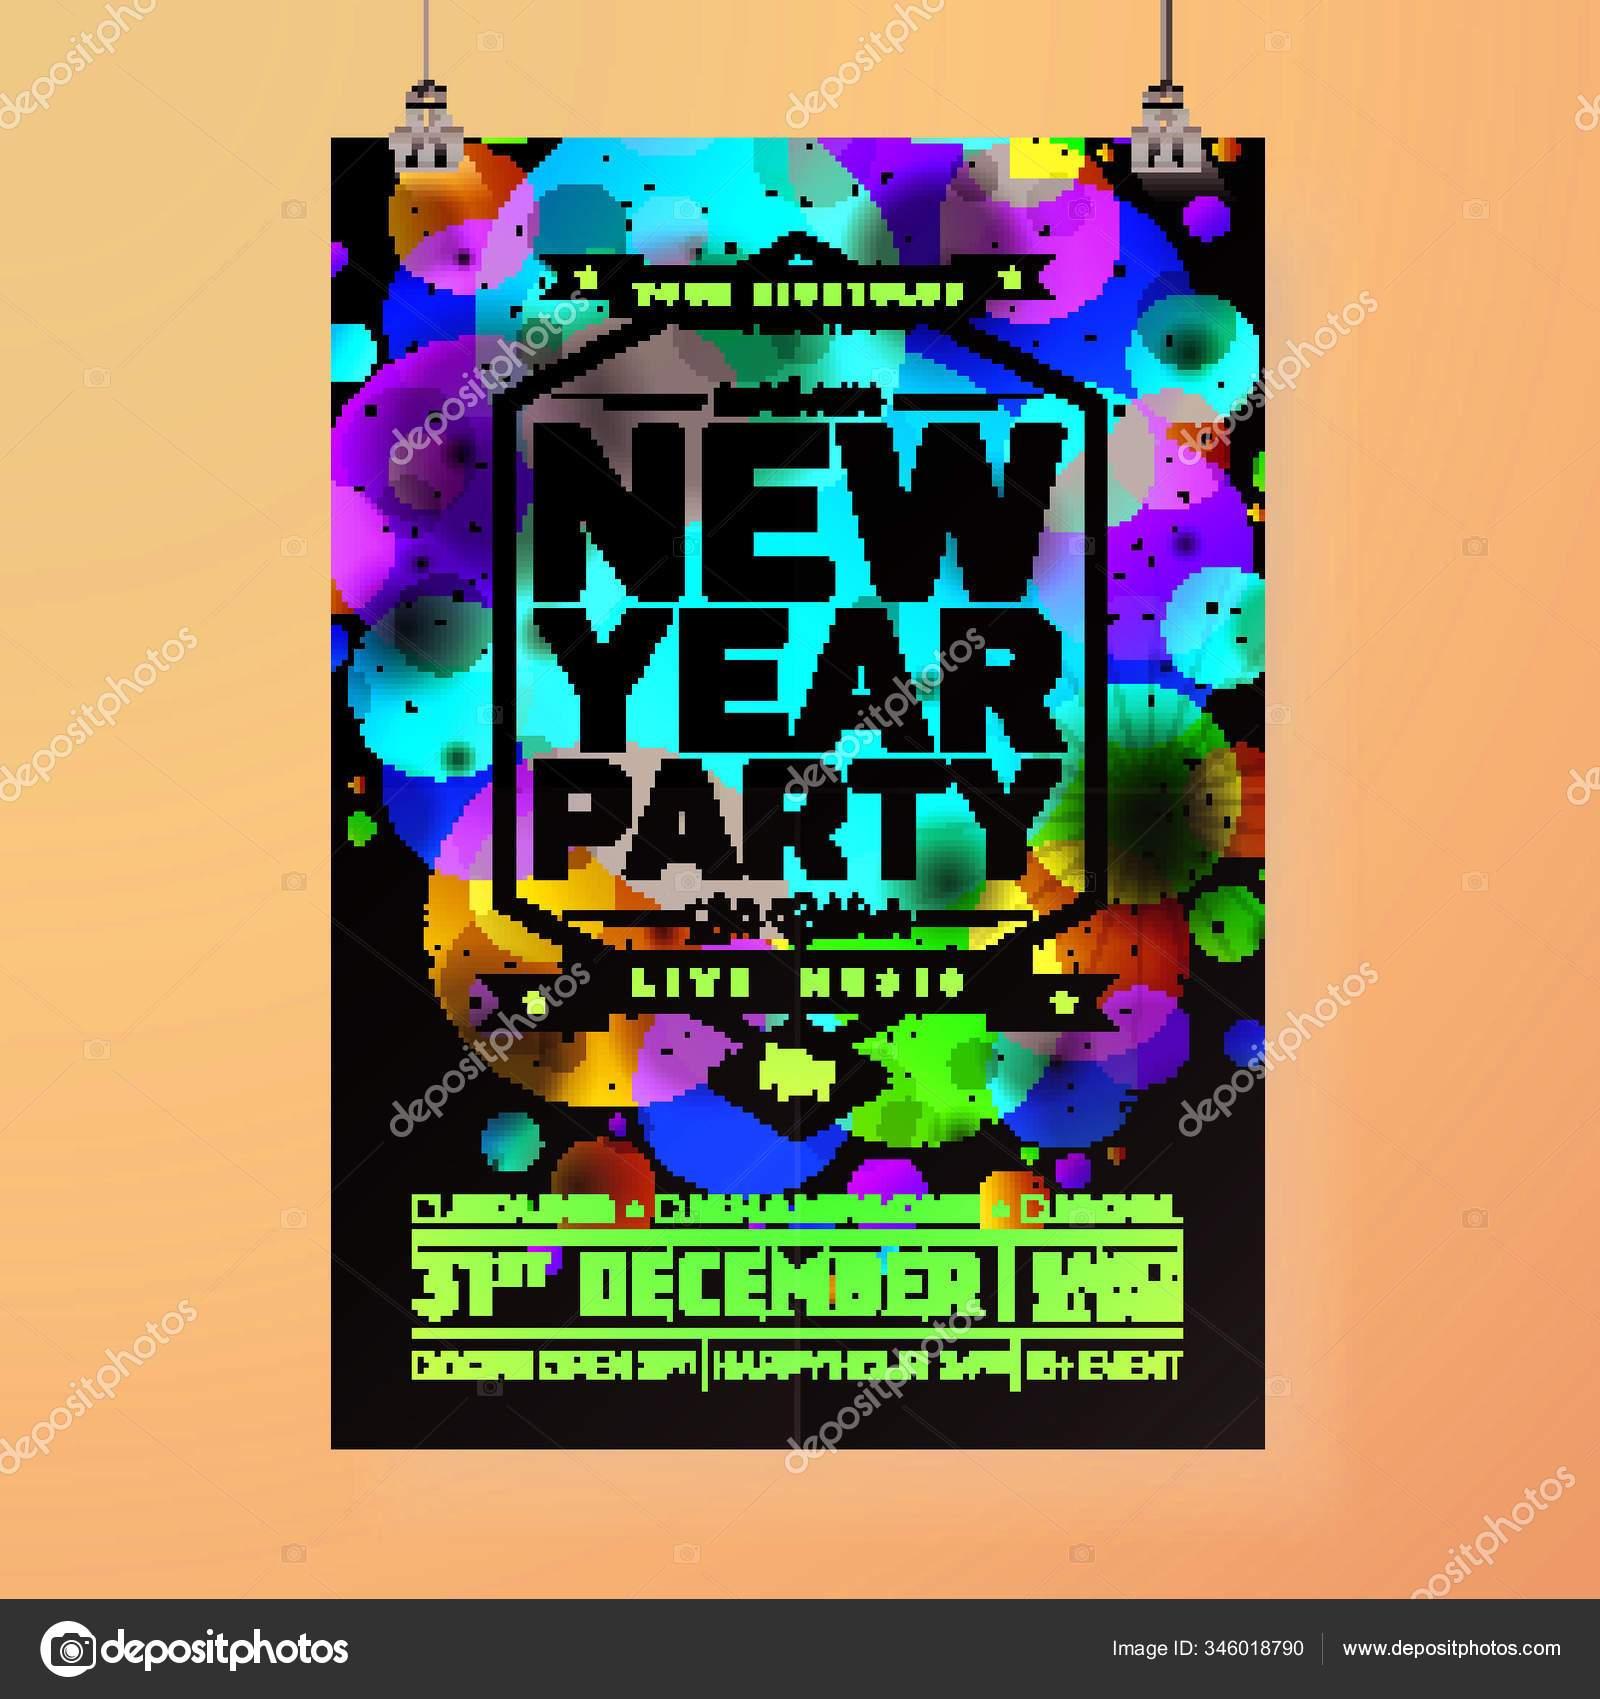 New Year Party Celebration Poster Illustration Typography Design Shiny Colorful Stok Vektor C Yayimages 346018790